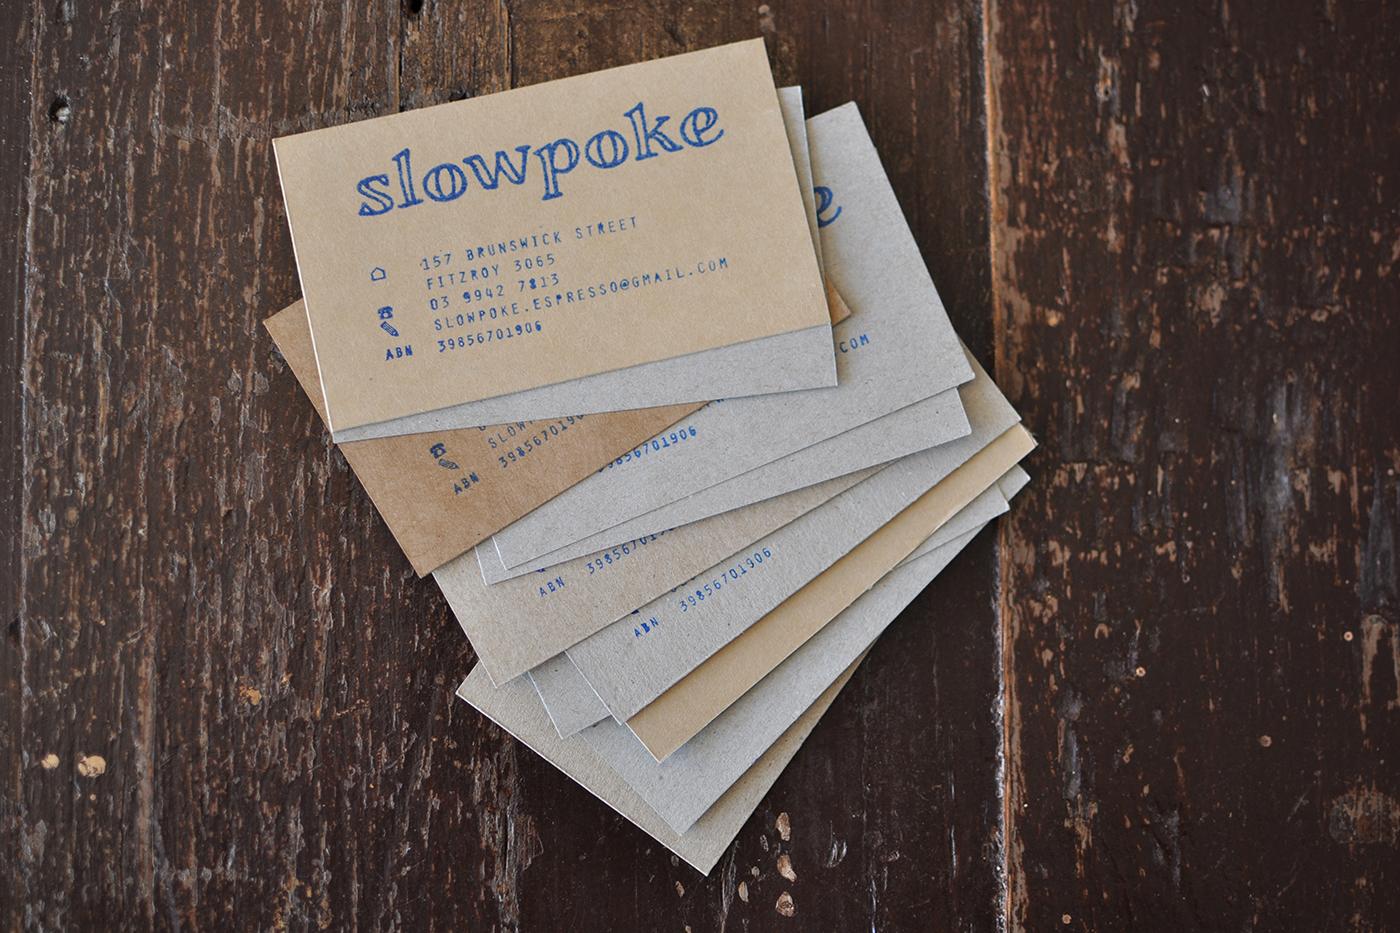 Slowpoke12